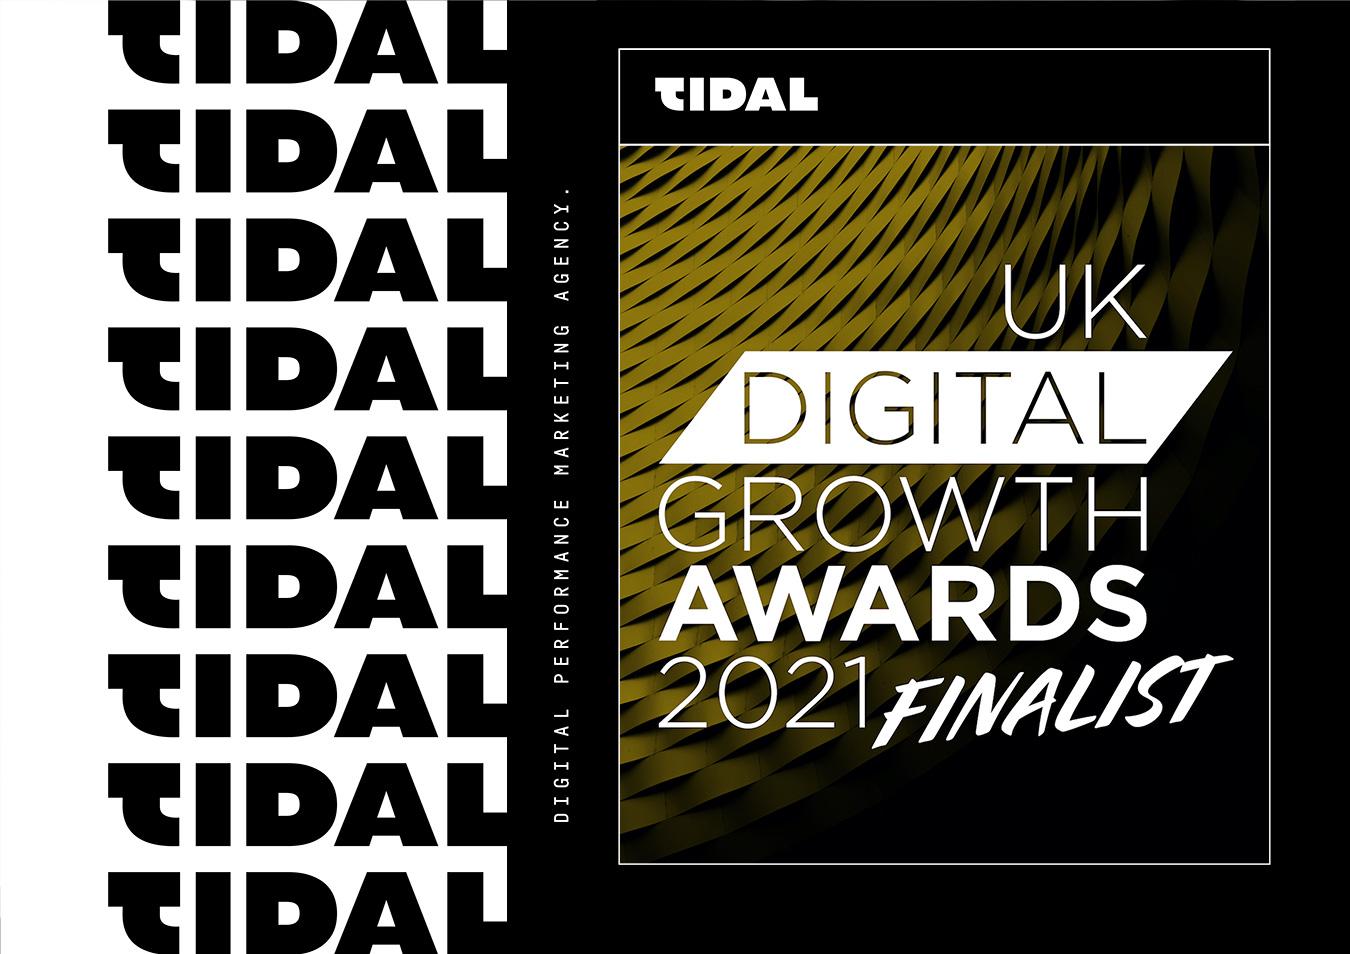 UK Digital Growth Awards 2021 Finalists